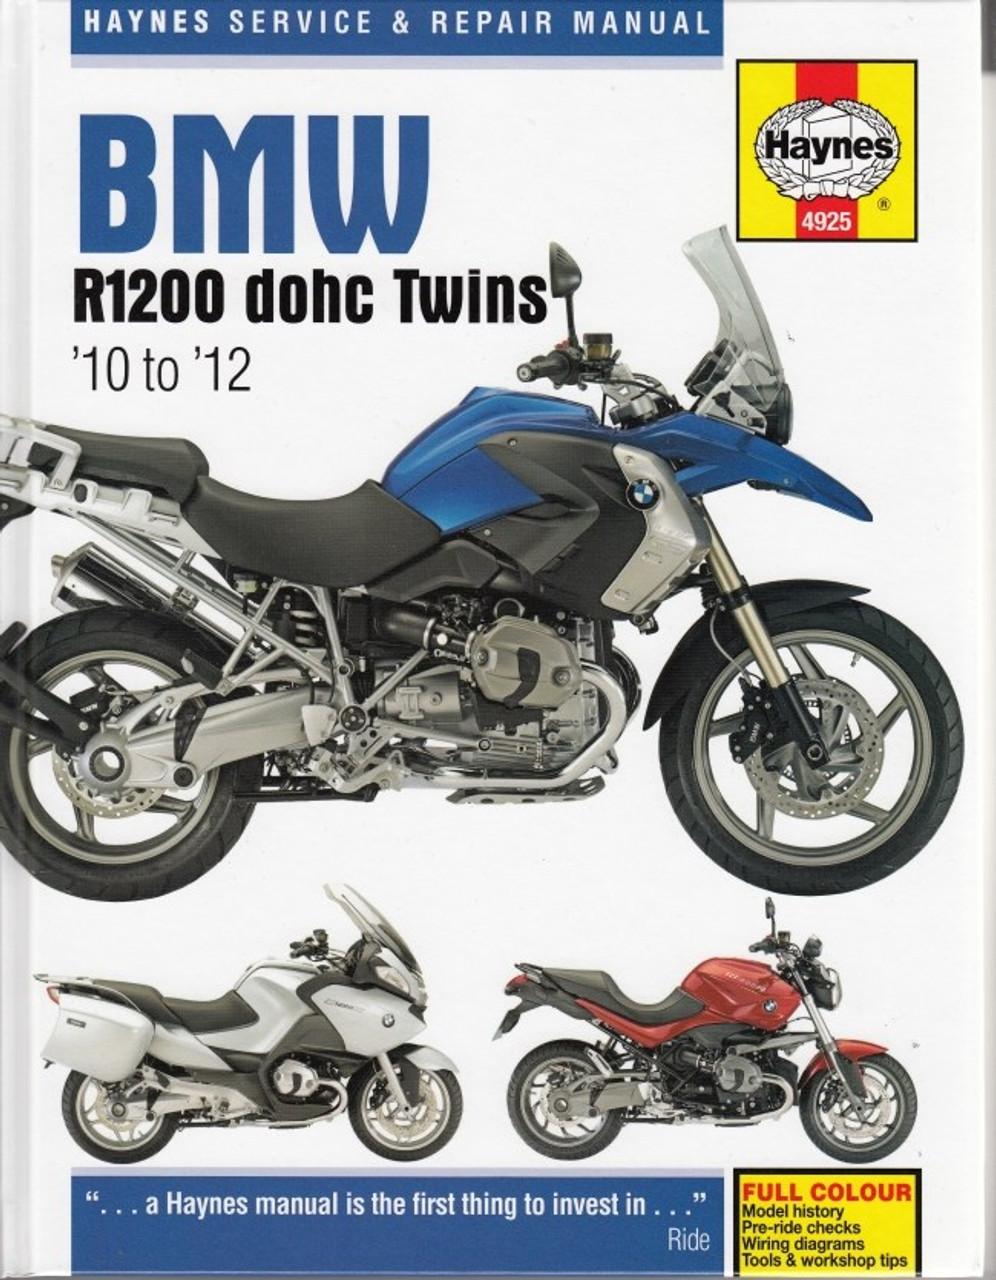 hight resolution of bmw r1200 dohc twins 2010 2012 workshop manual 2010 bmw r1200rt wiring diagram